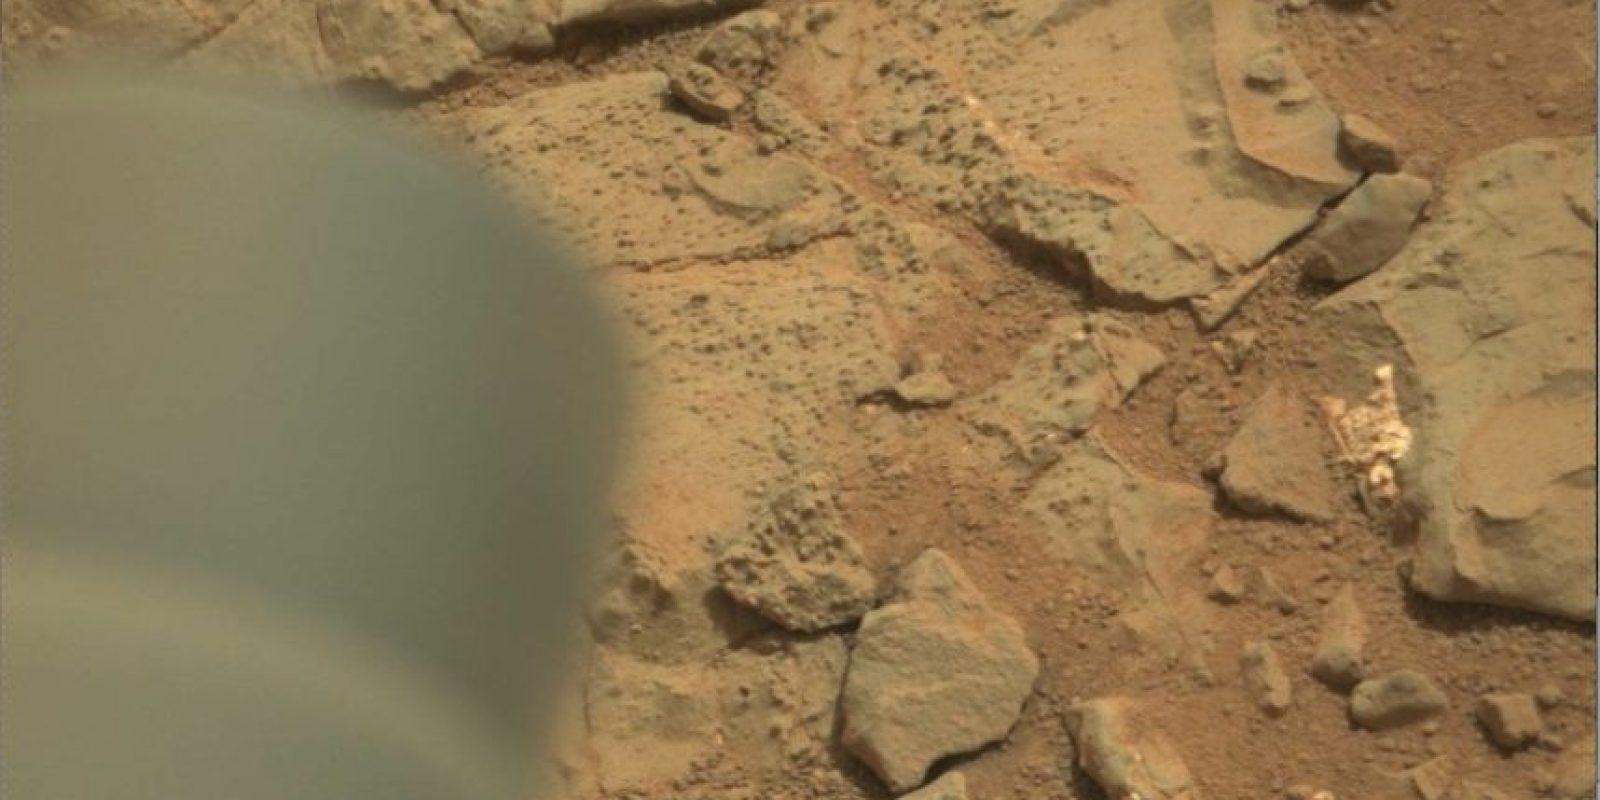 Esta es la imagen difundida por la NASA Foto: original en http://mars.jpl.nasa.gov/msl-raw-images/msss/00153/mcam/0153MR0008470180201260E01_DXXX.jpg